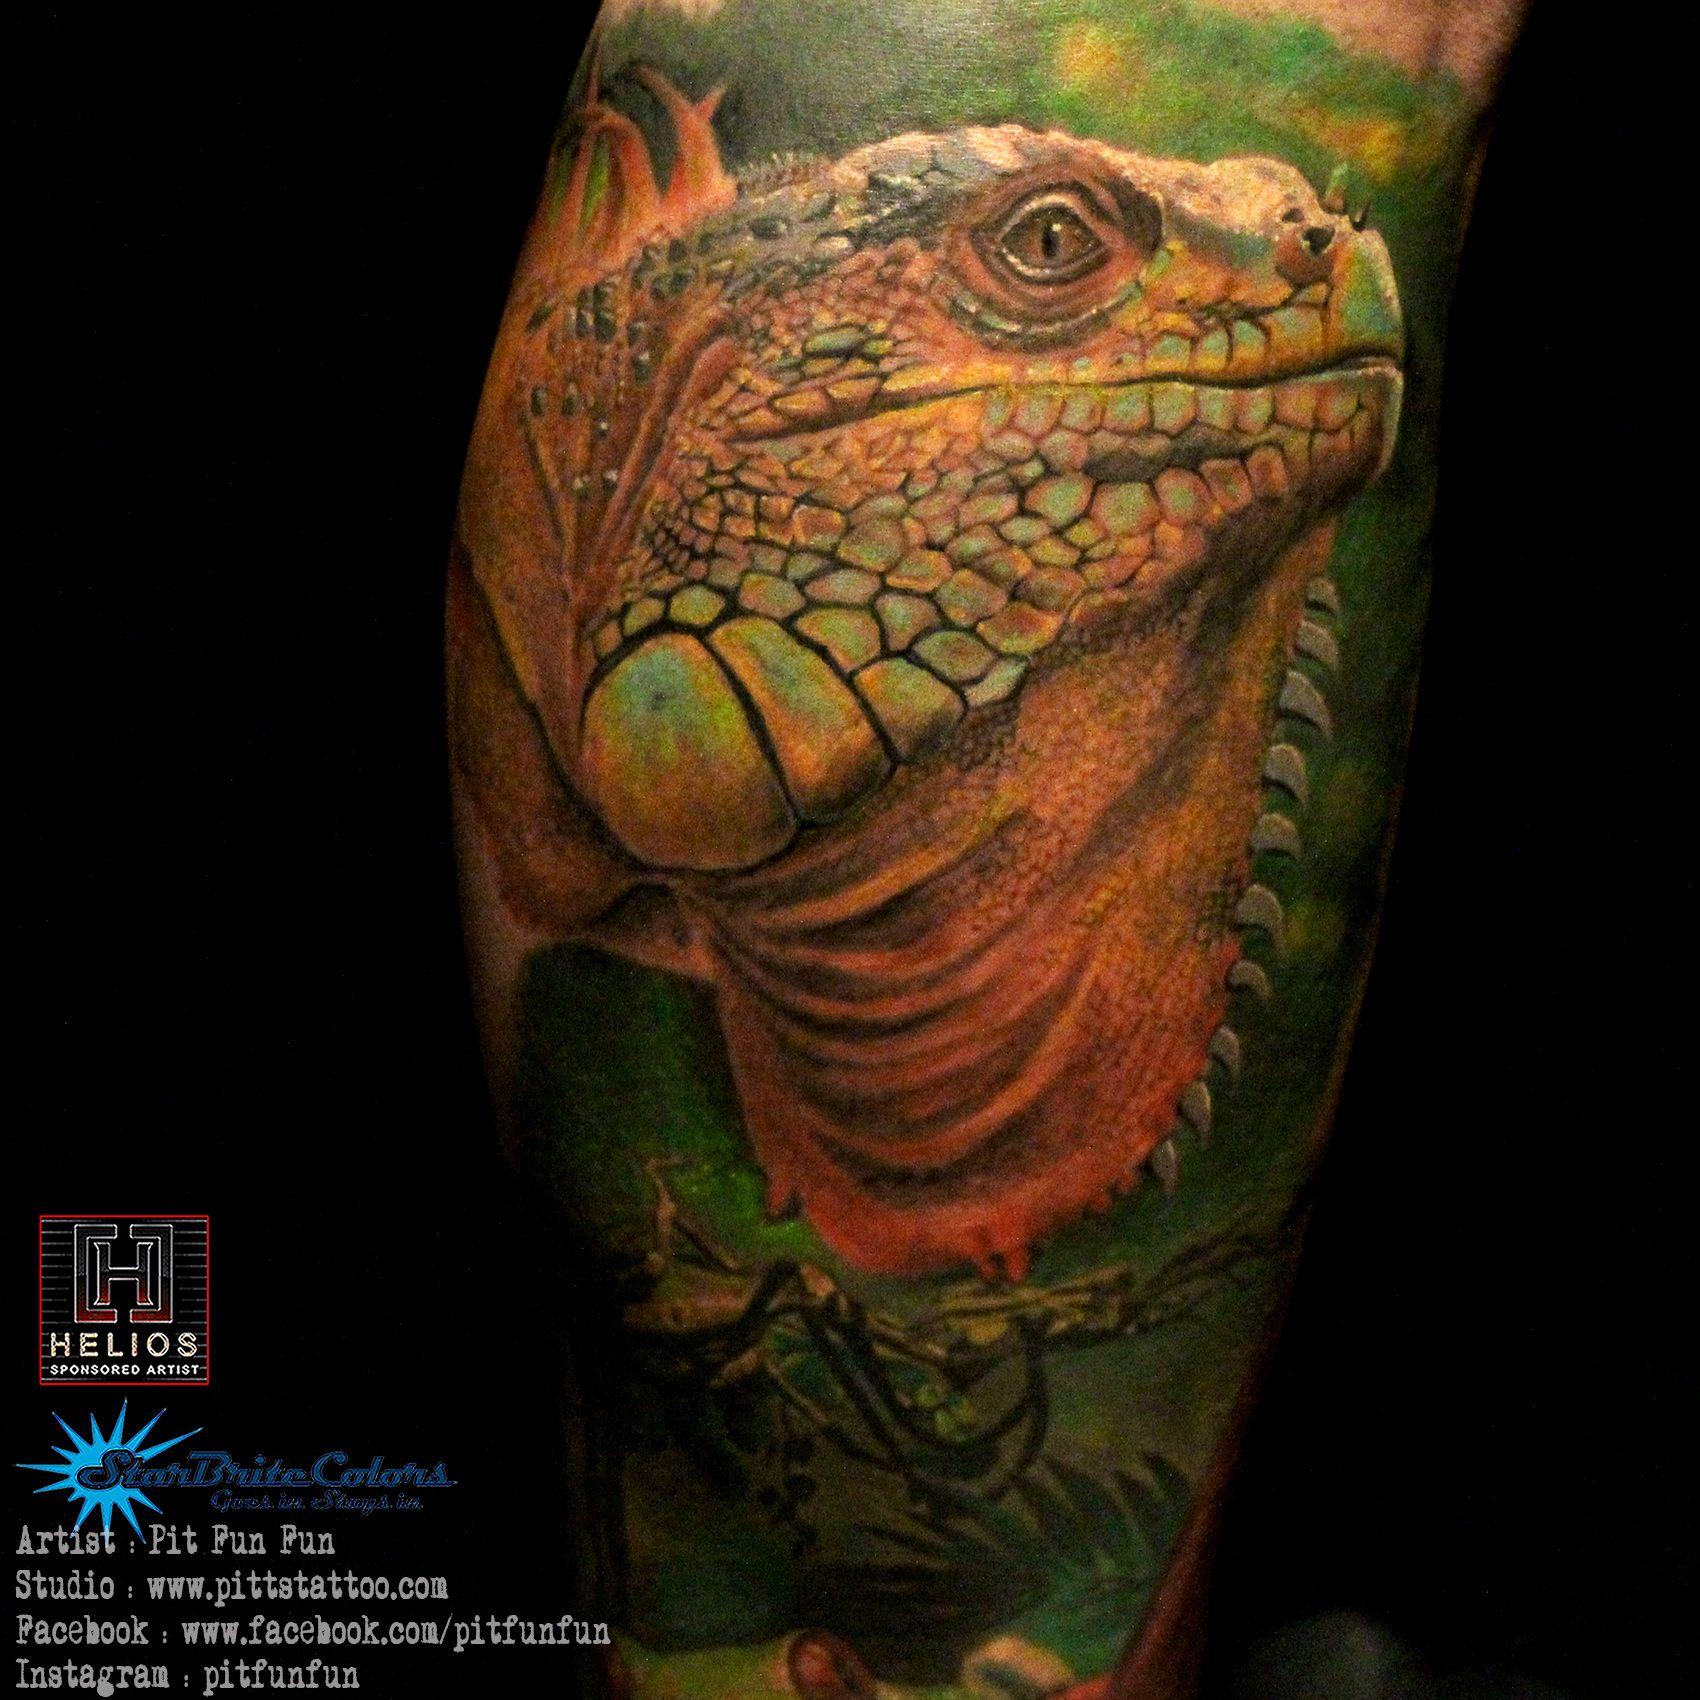 Closed Up Realistic Iguana Tattoo Done By Pit Fun Instagram Pitfunfun